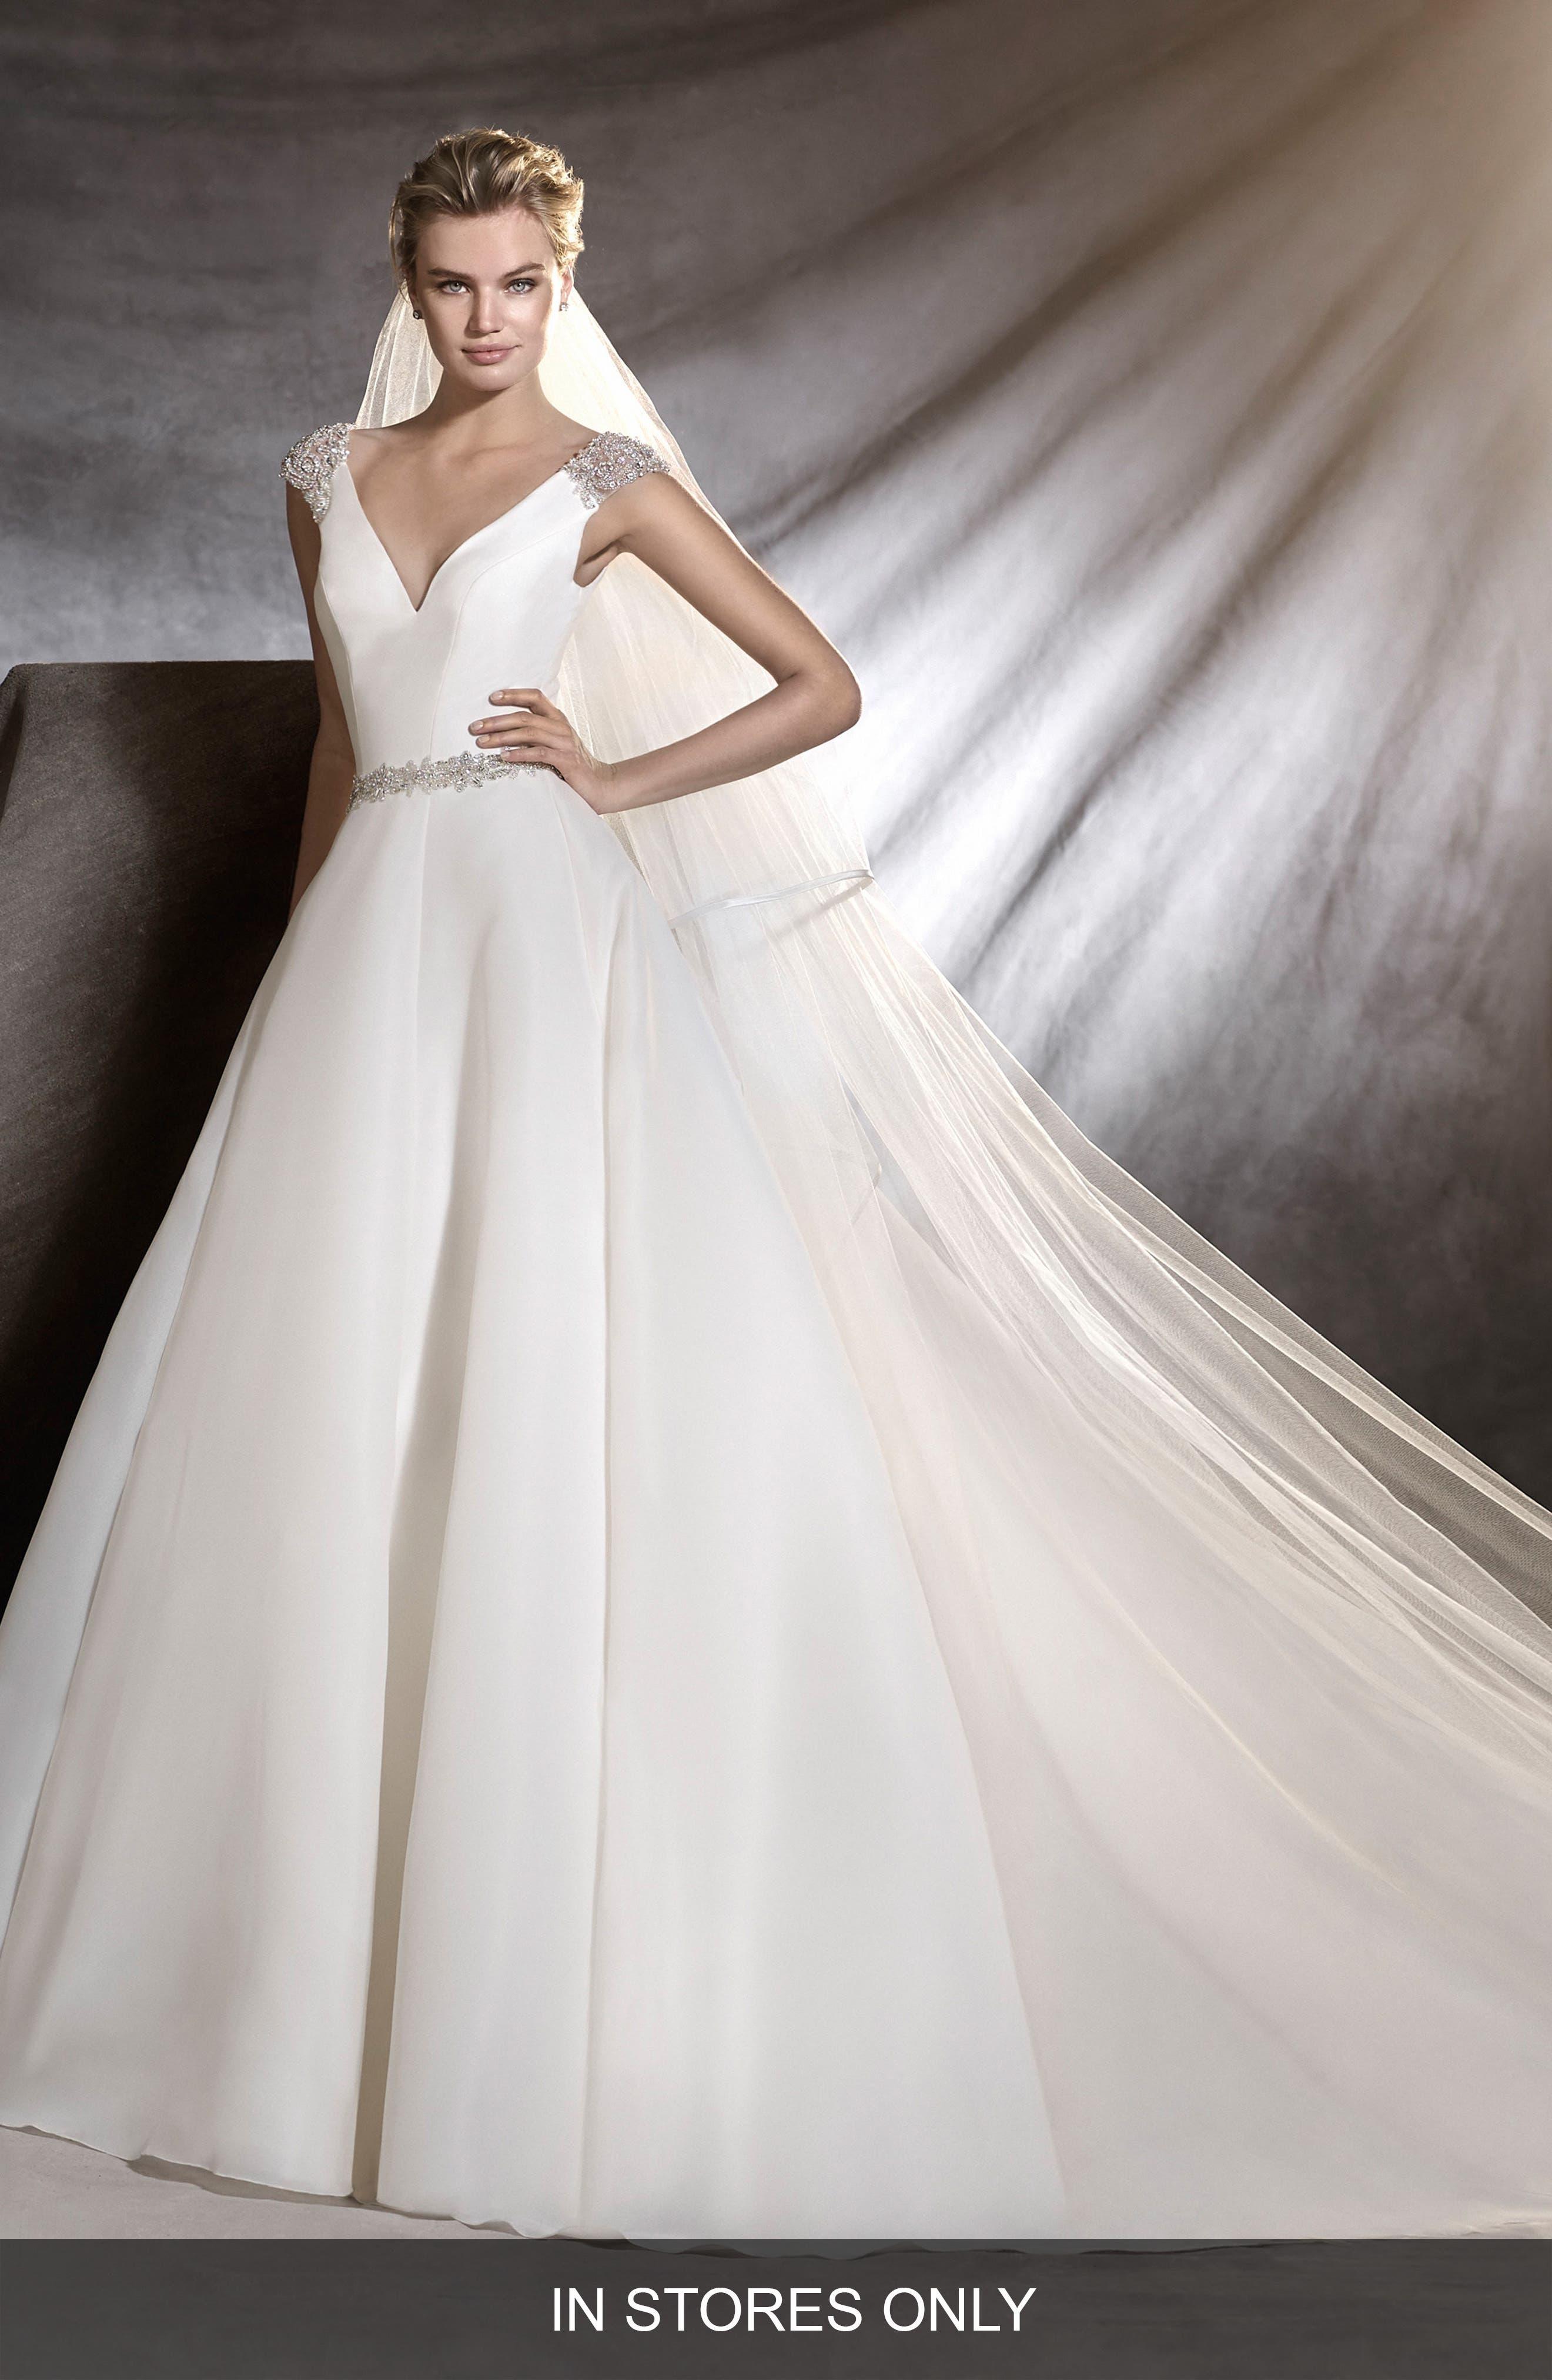 Ovidia Beaded Cap Sleeve Organza Ballgown,                         Main,                         color,